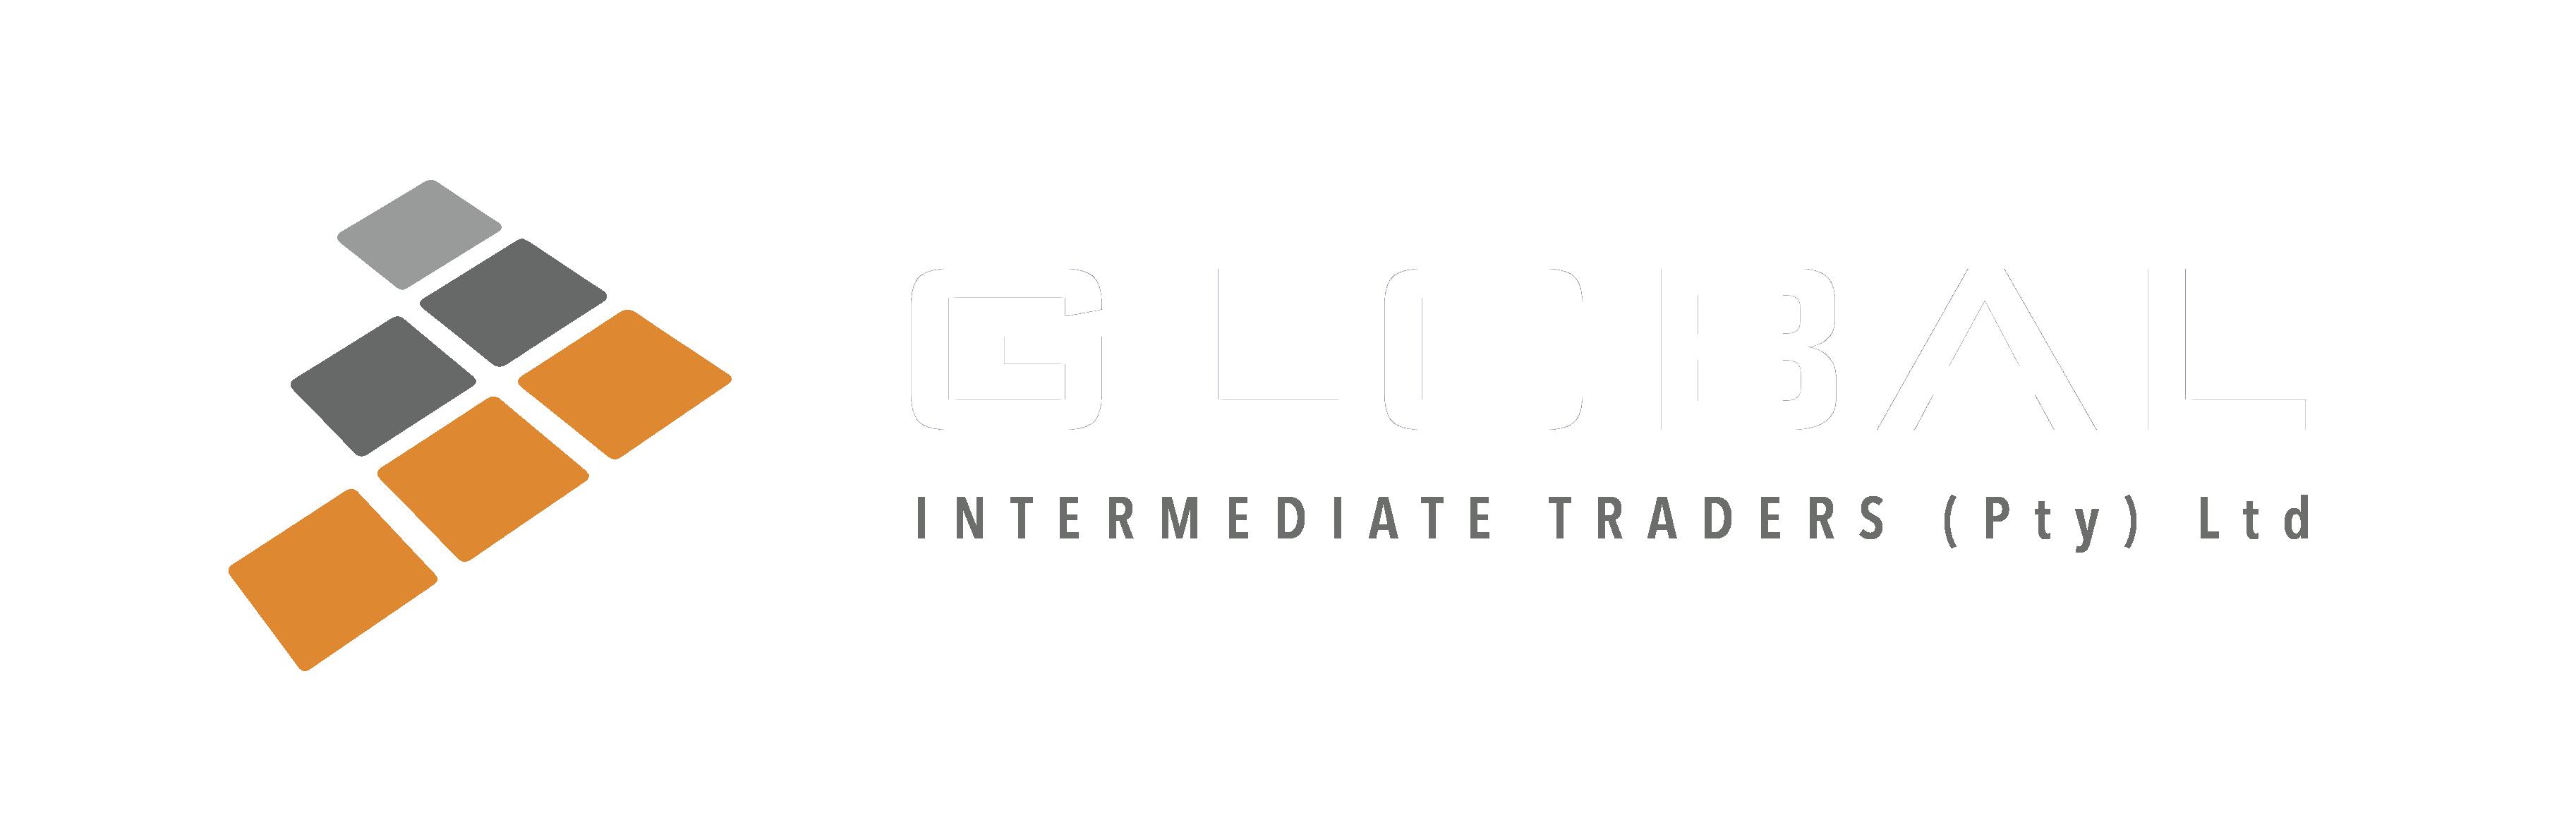 Global Intermediate Traders